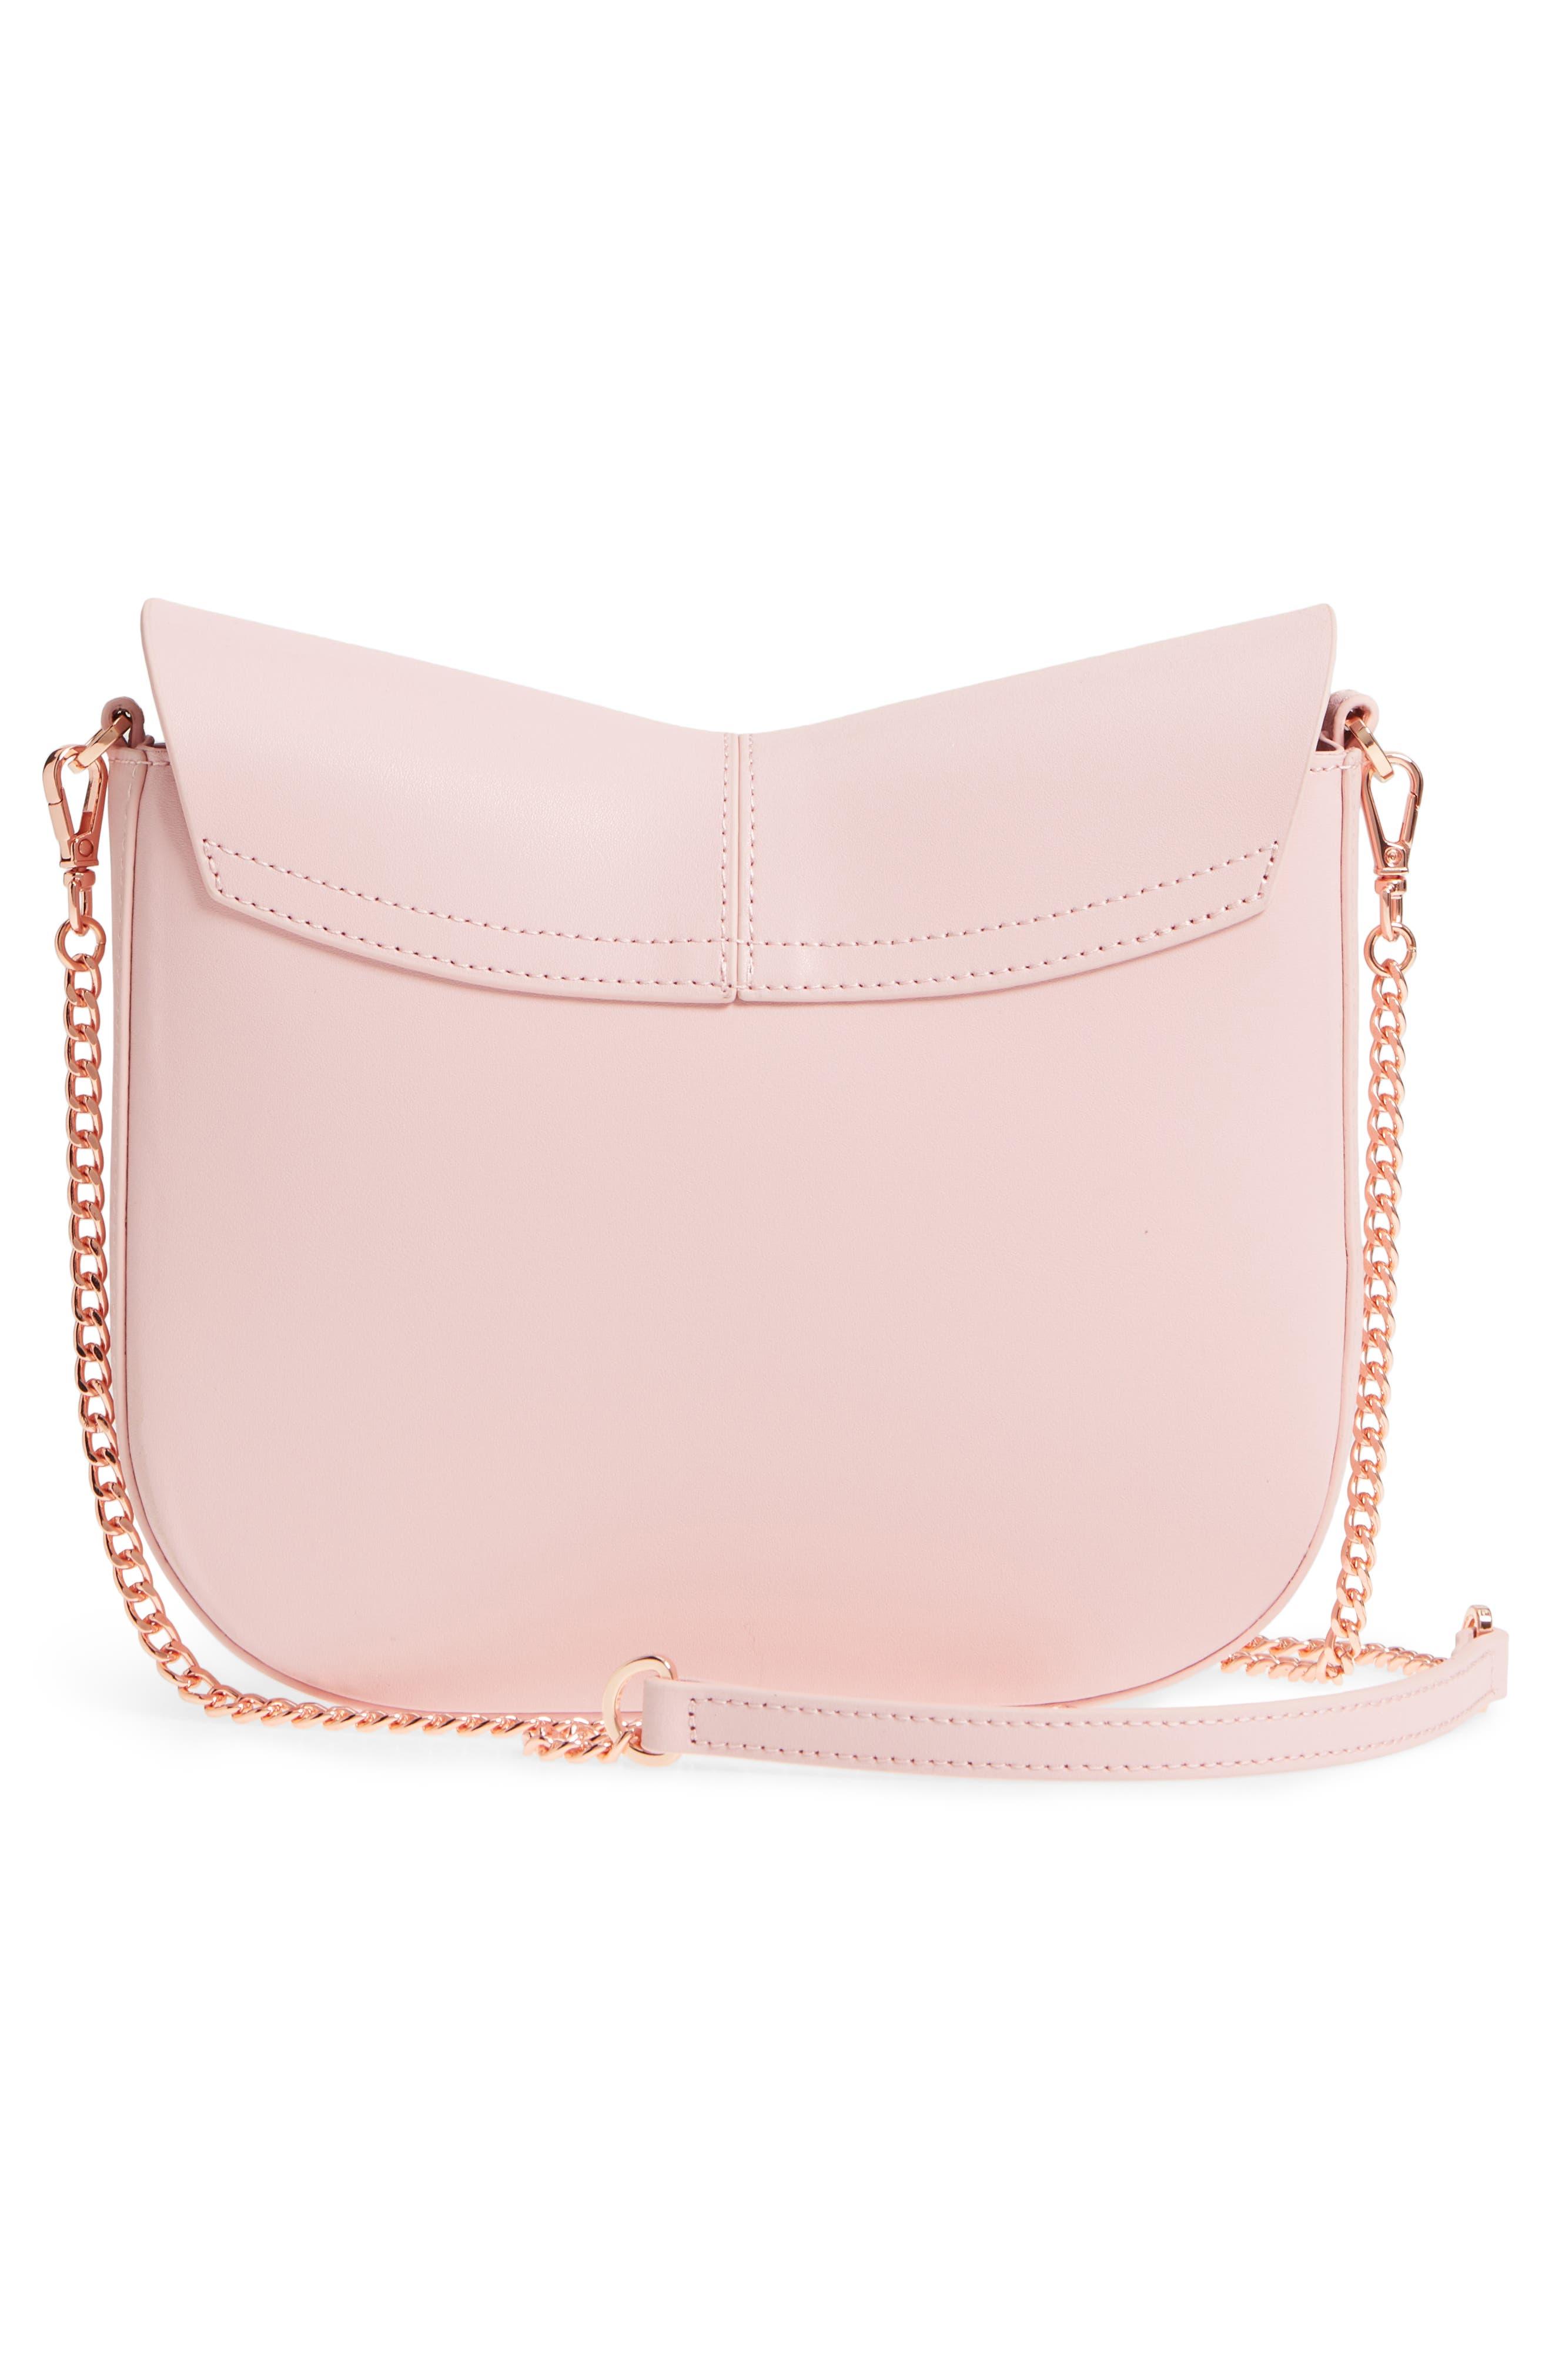 Chriiss Cat Stud Leather Crossbody Bag,                             Alternate thumbnail 8, color,